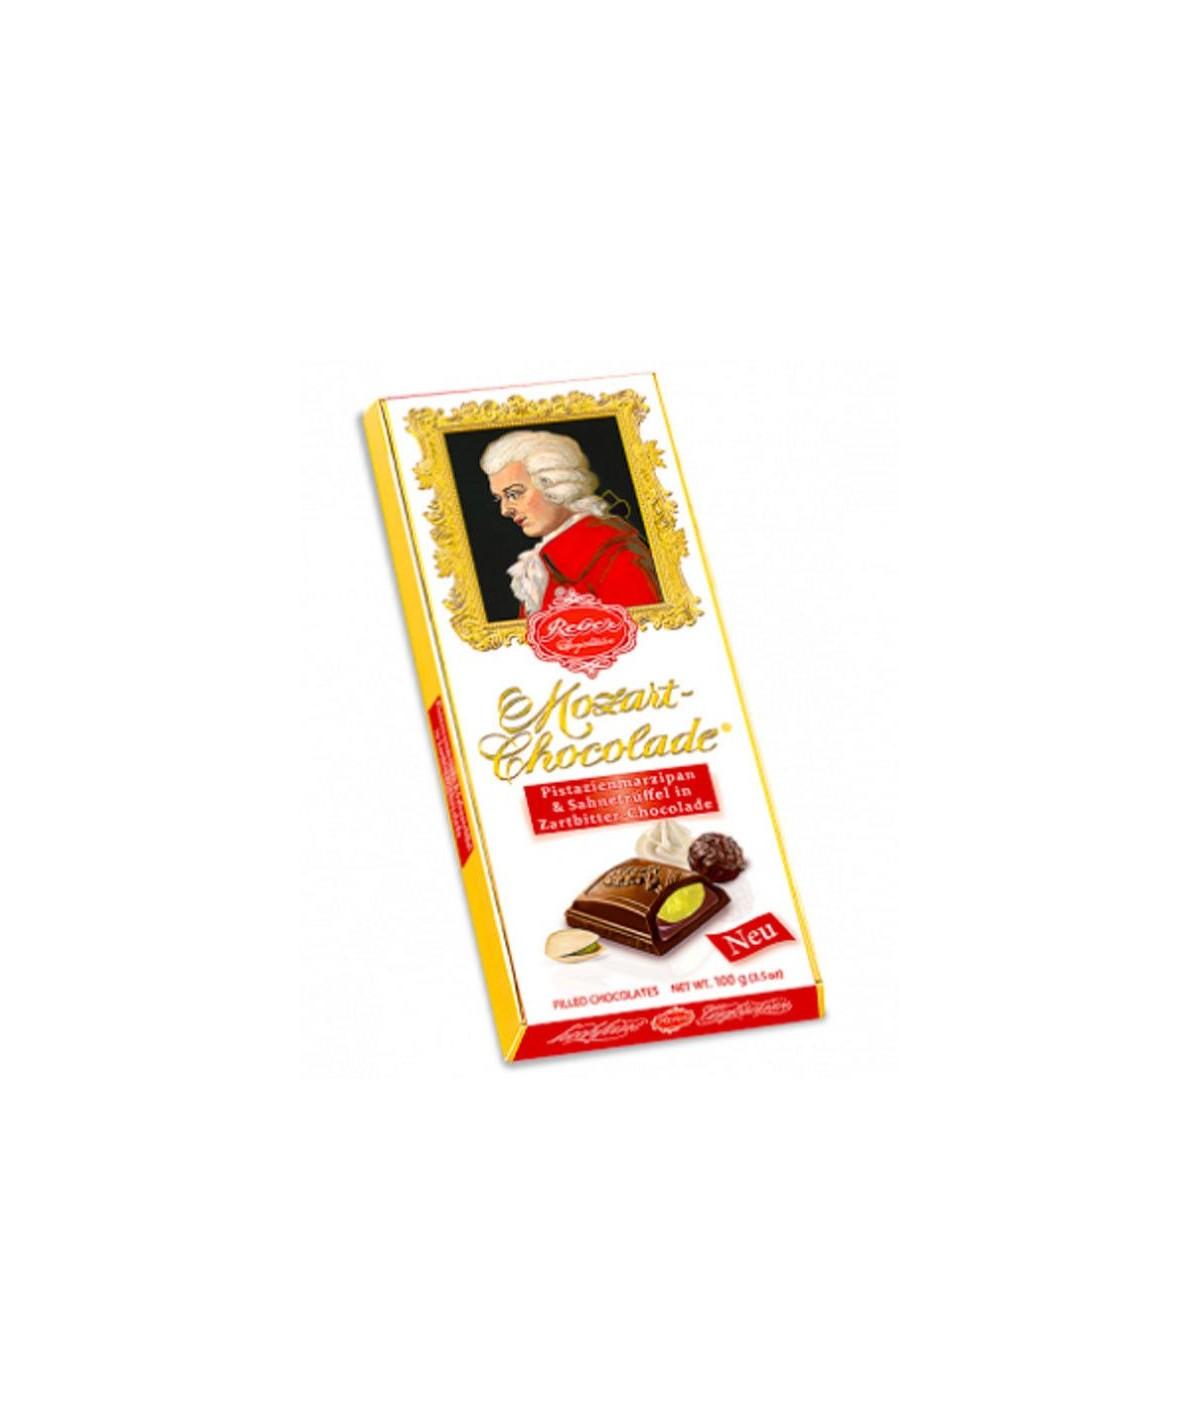 Mozart Chocolade Tafel Reber 100g